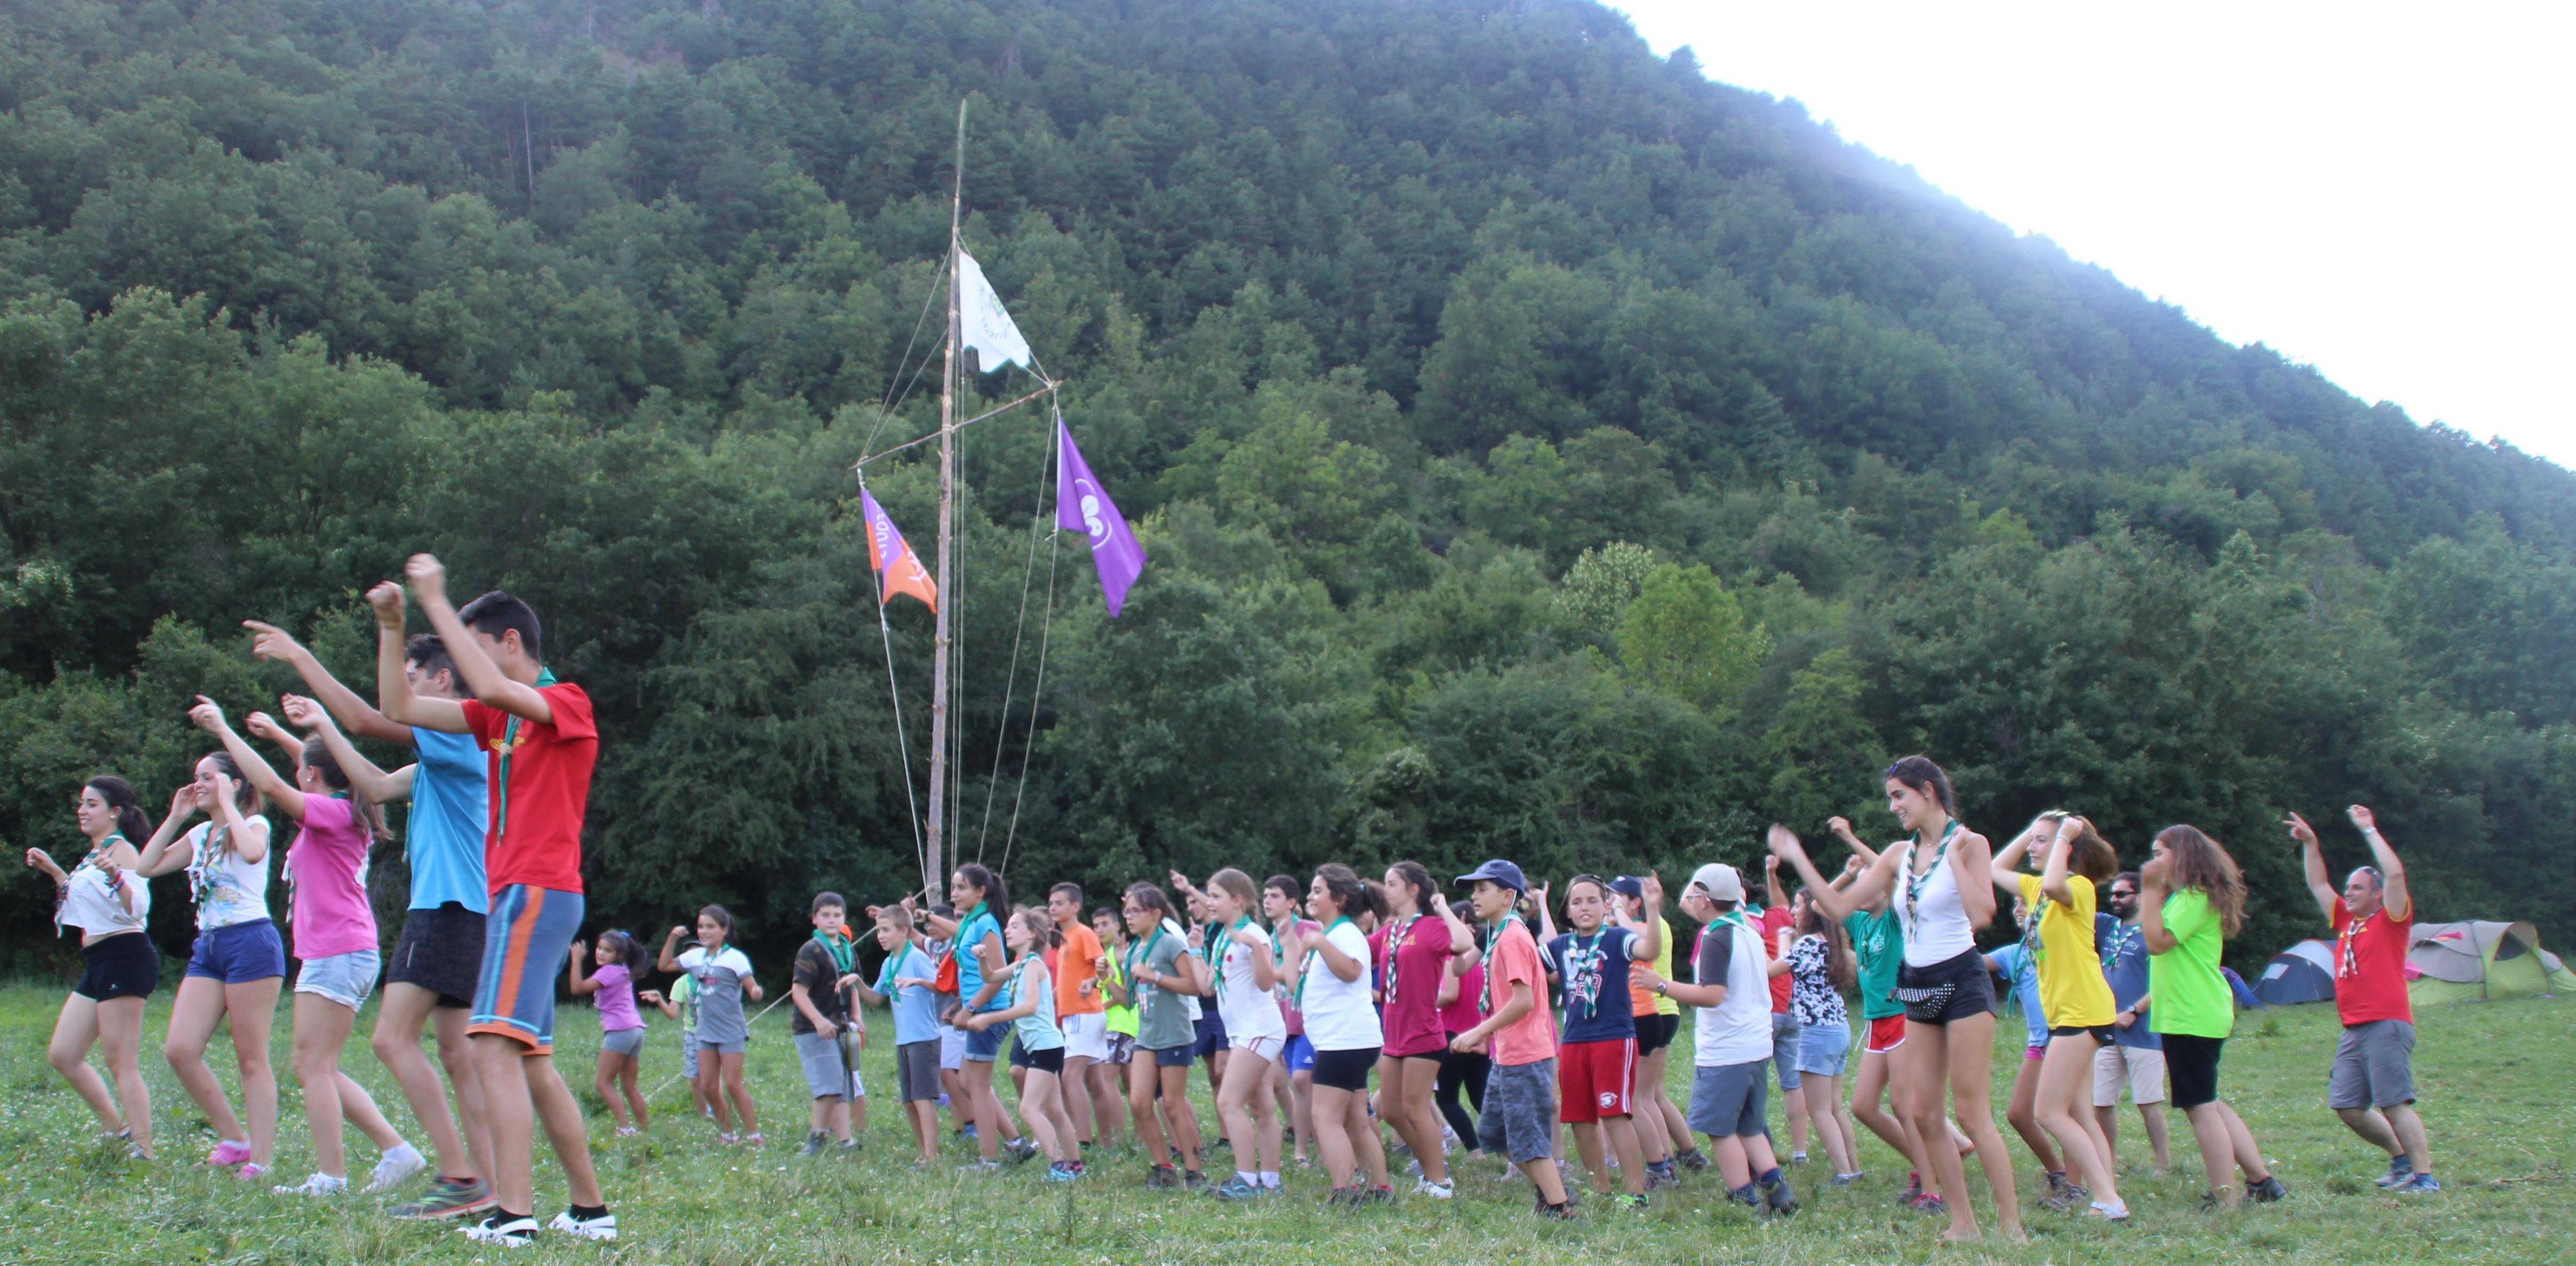 15-16 - Grupo - Campamento de verano - P78